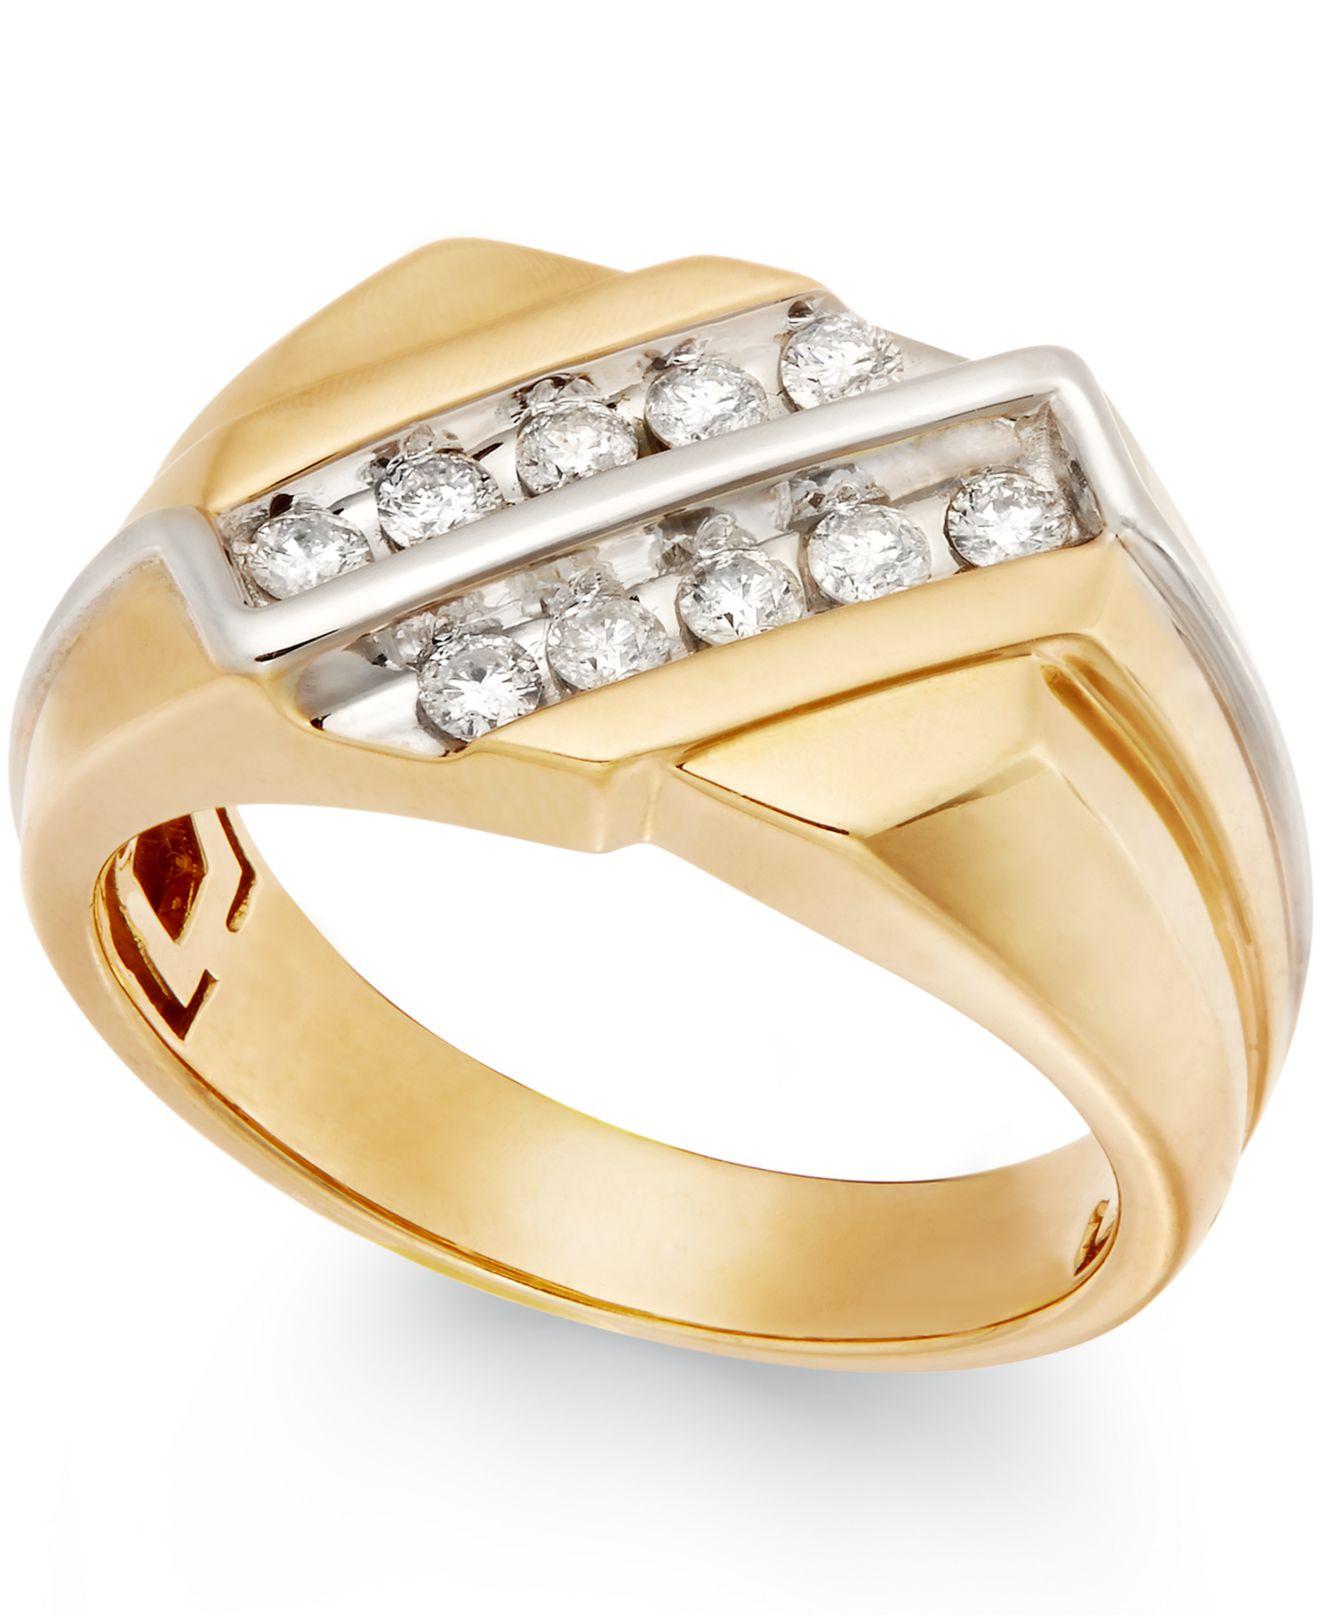 Mens Diamond Rings At Macy S